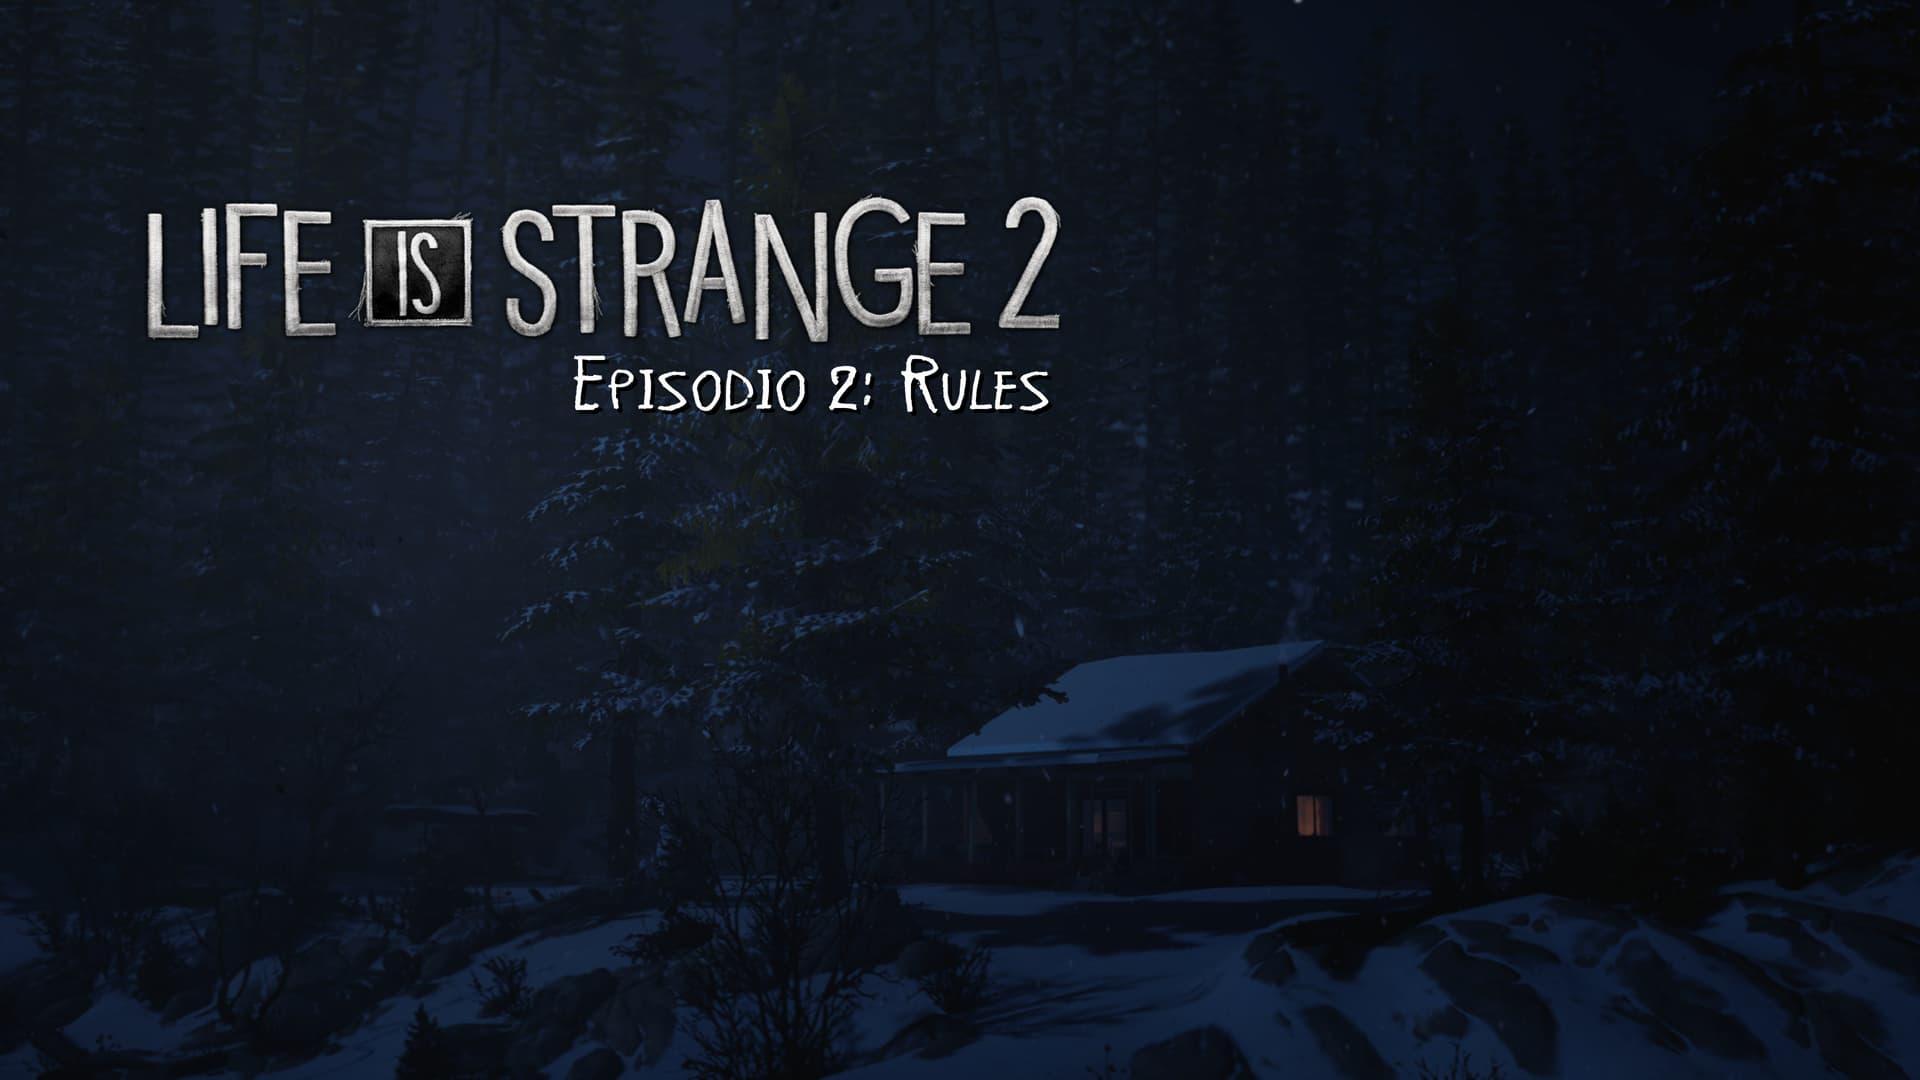 Análisis de Life is Strange 2: Episodio 2 - Xbox One 1